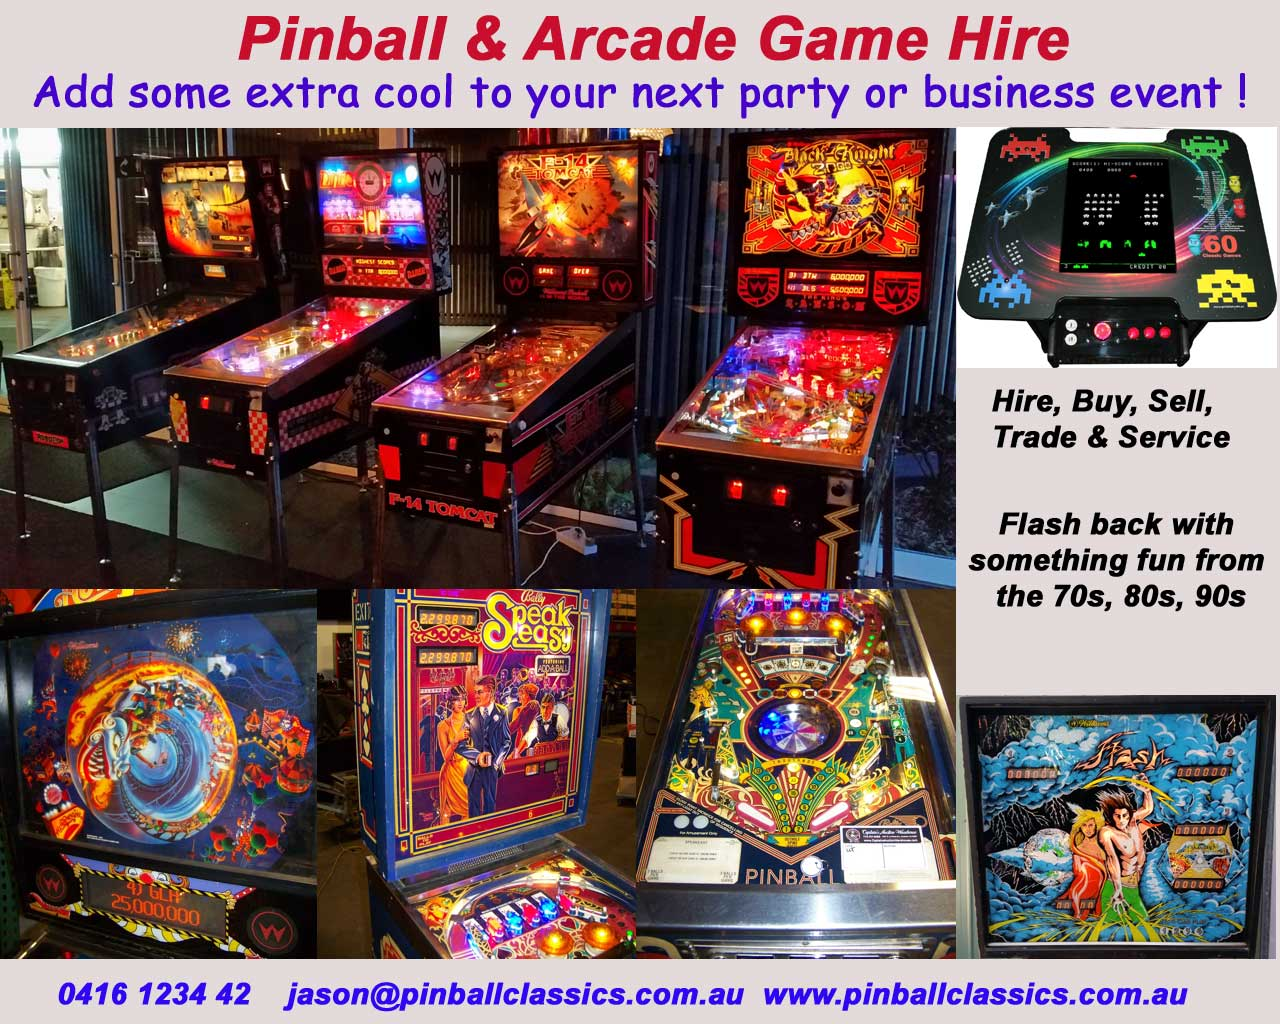 PINBALL MACHINE Sale, Buy, Sell, Trade, Repair, Service